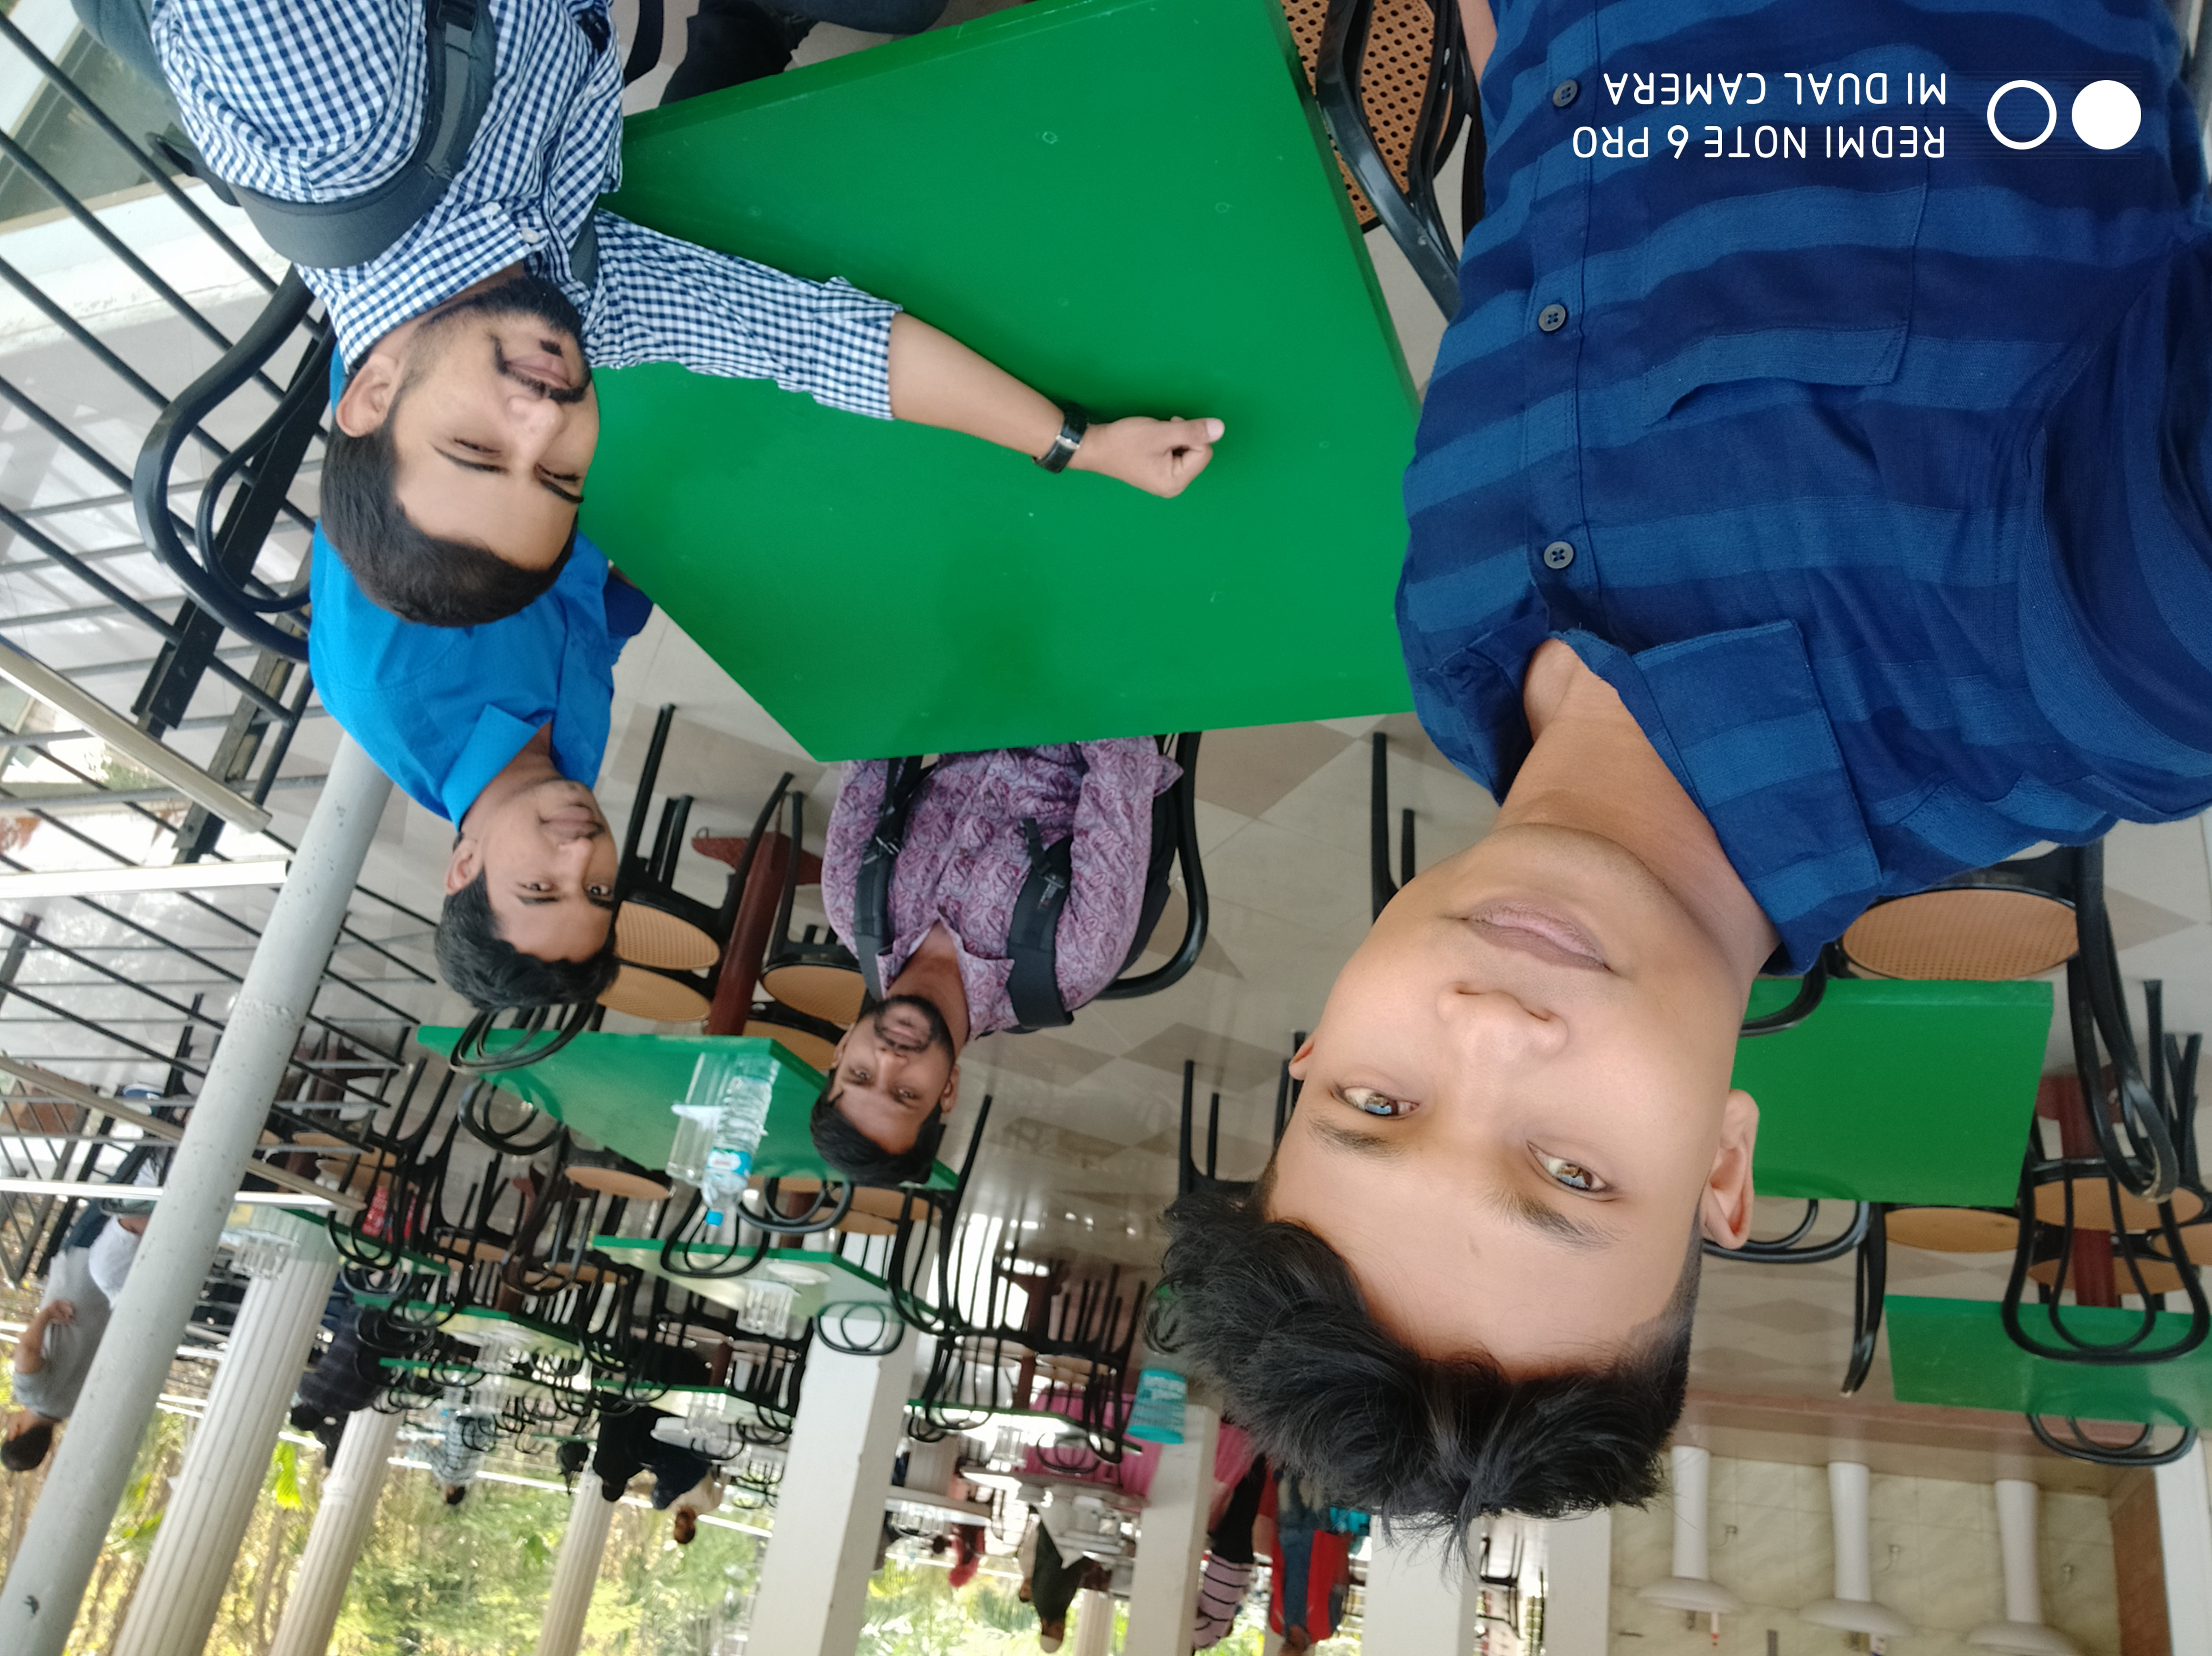 Rubel Hossain Cover Image